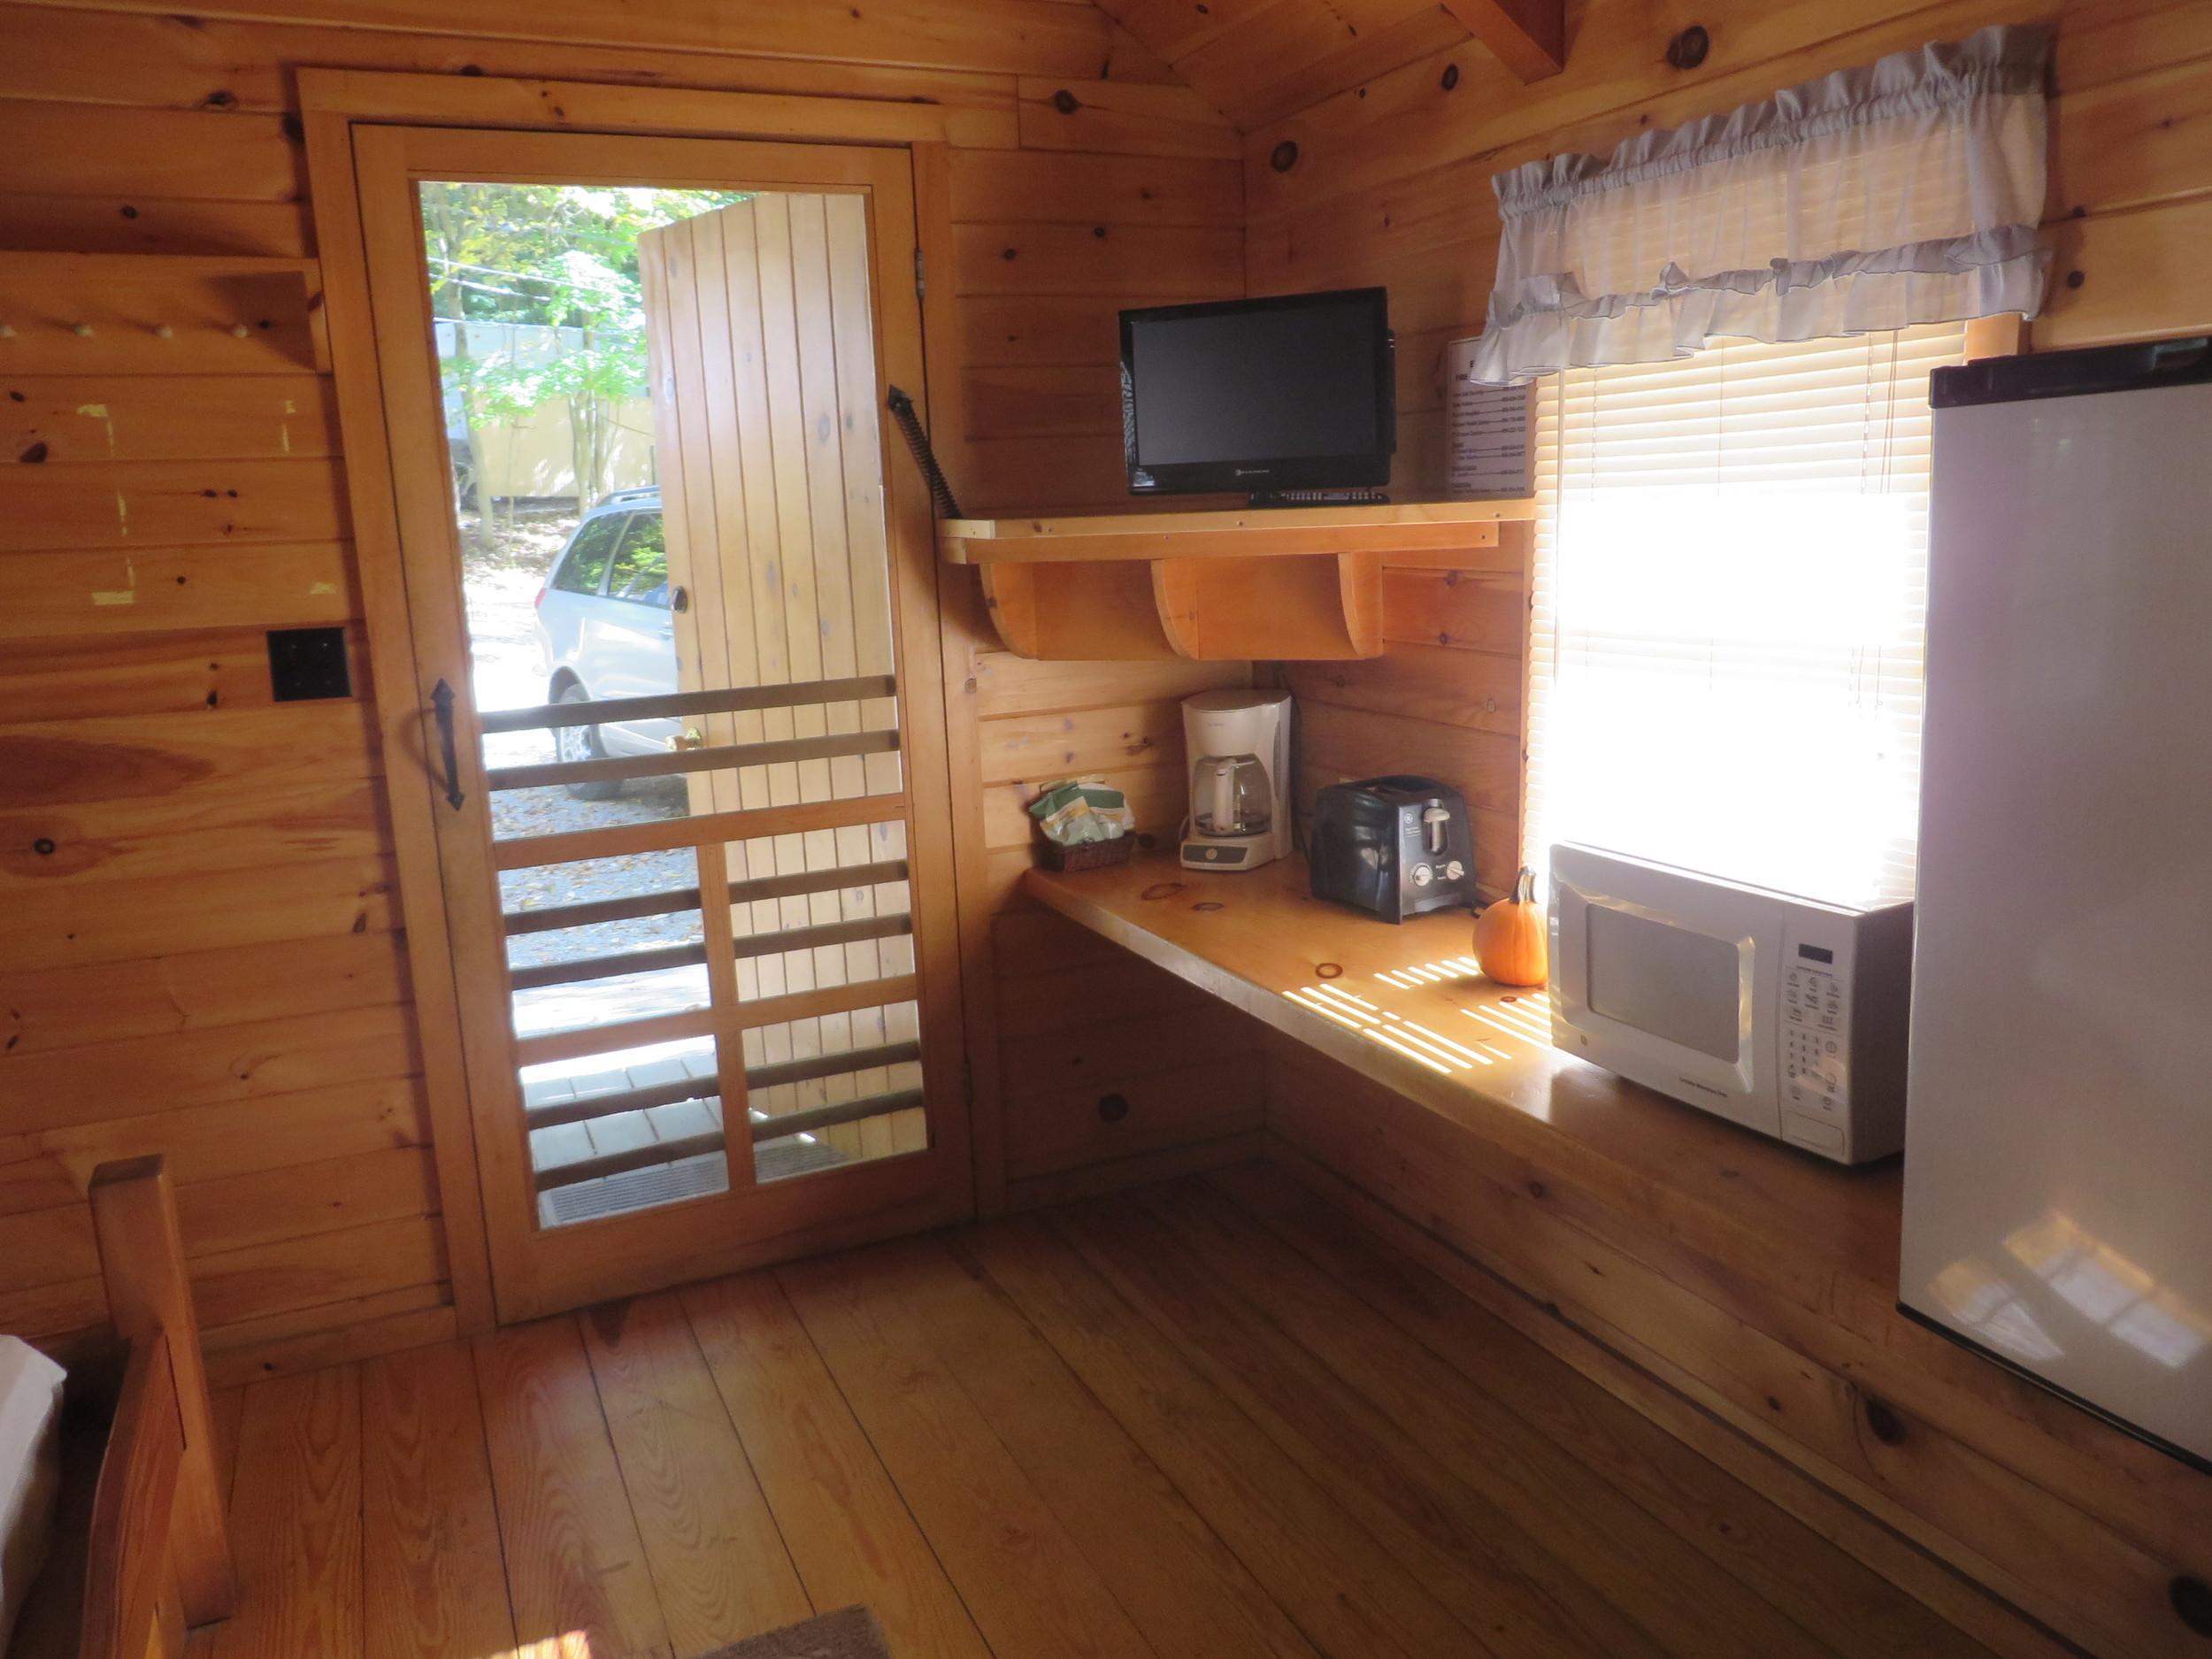 front door and kitchenette in cabin